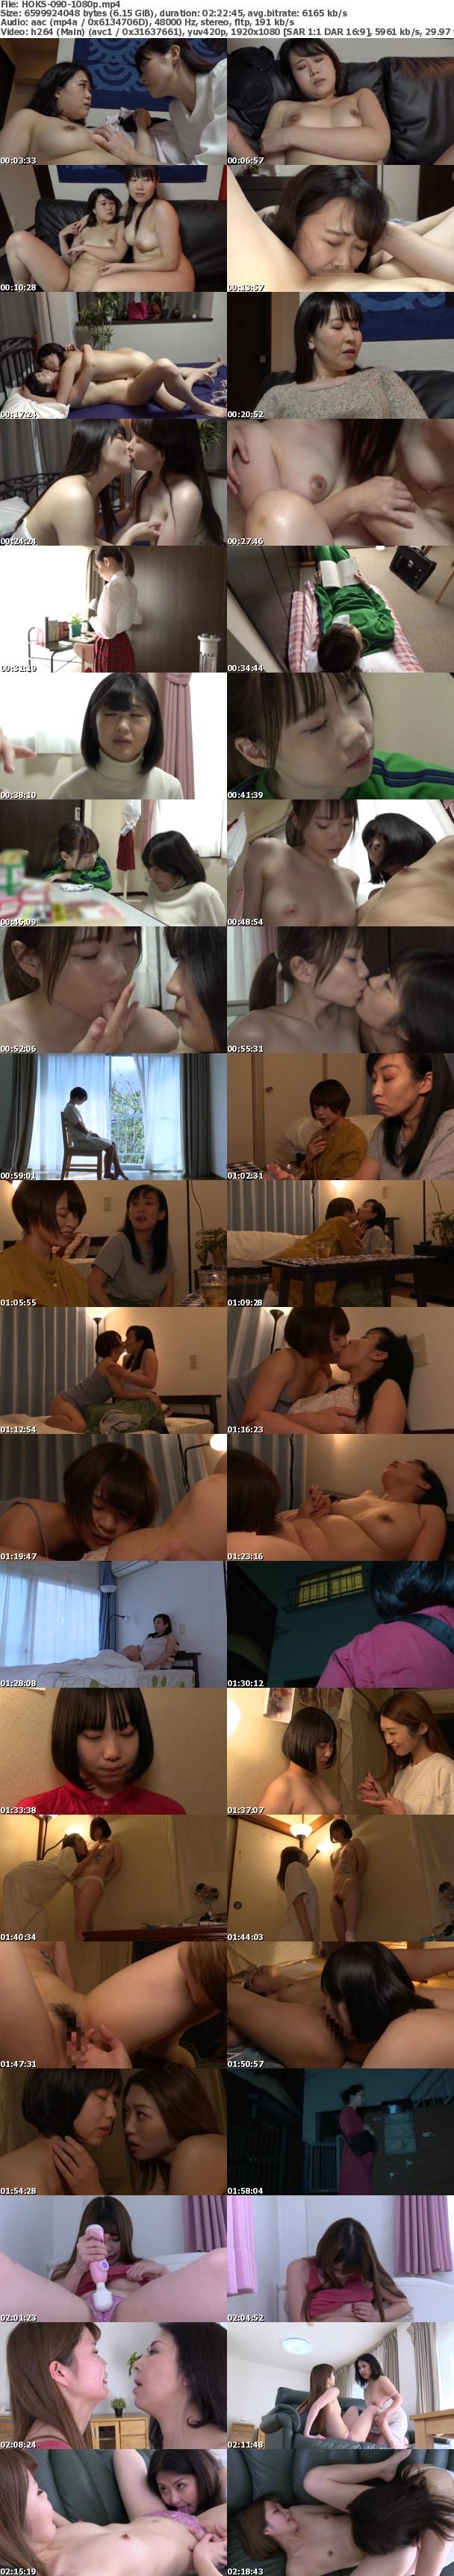 (Full HD) HOKS-090 レズ密着 ネコとタチ 11人のワイセツ接吻